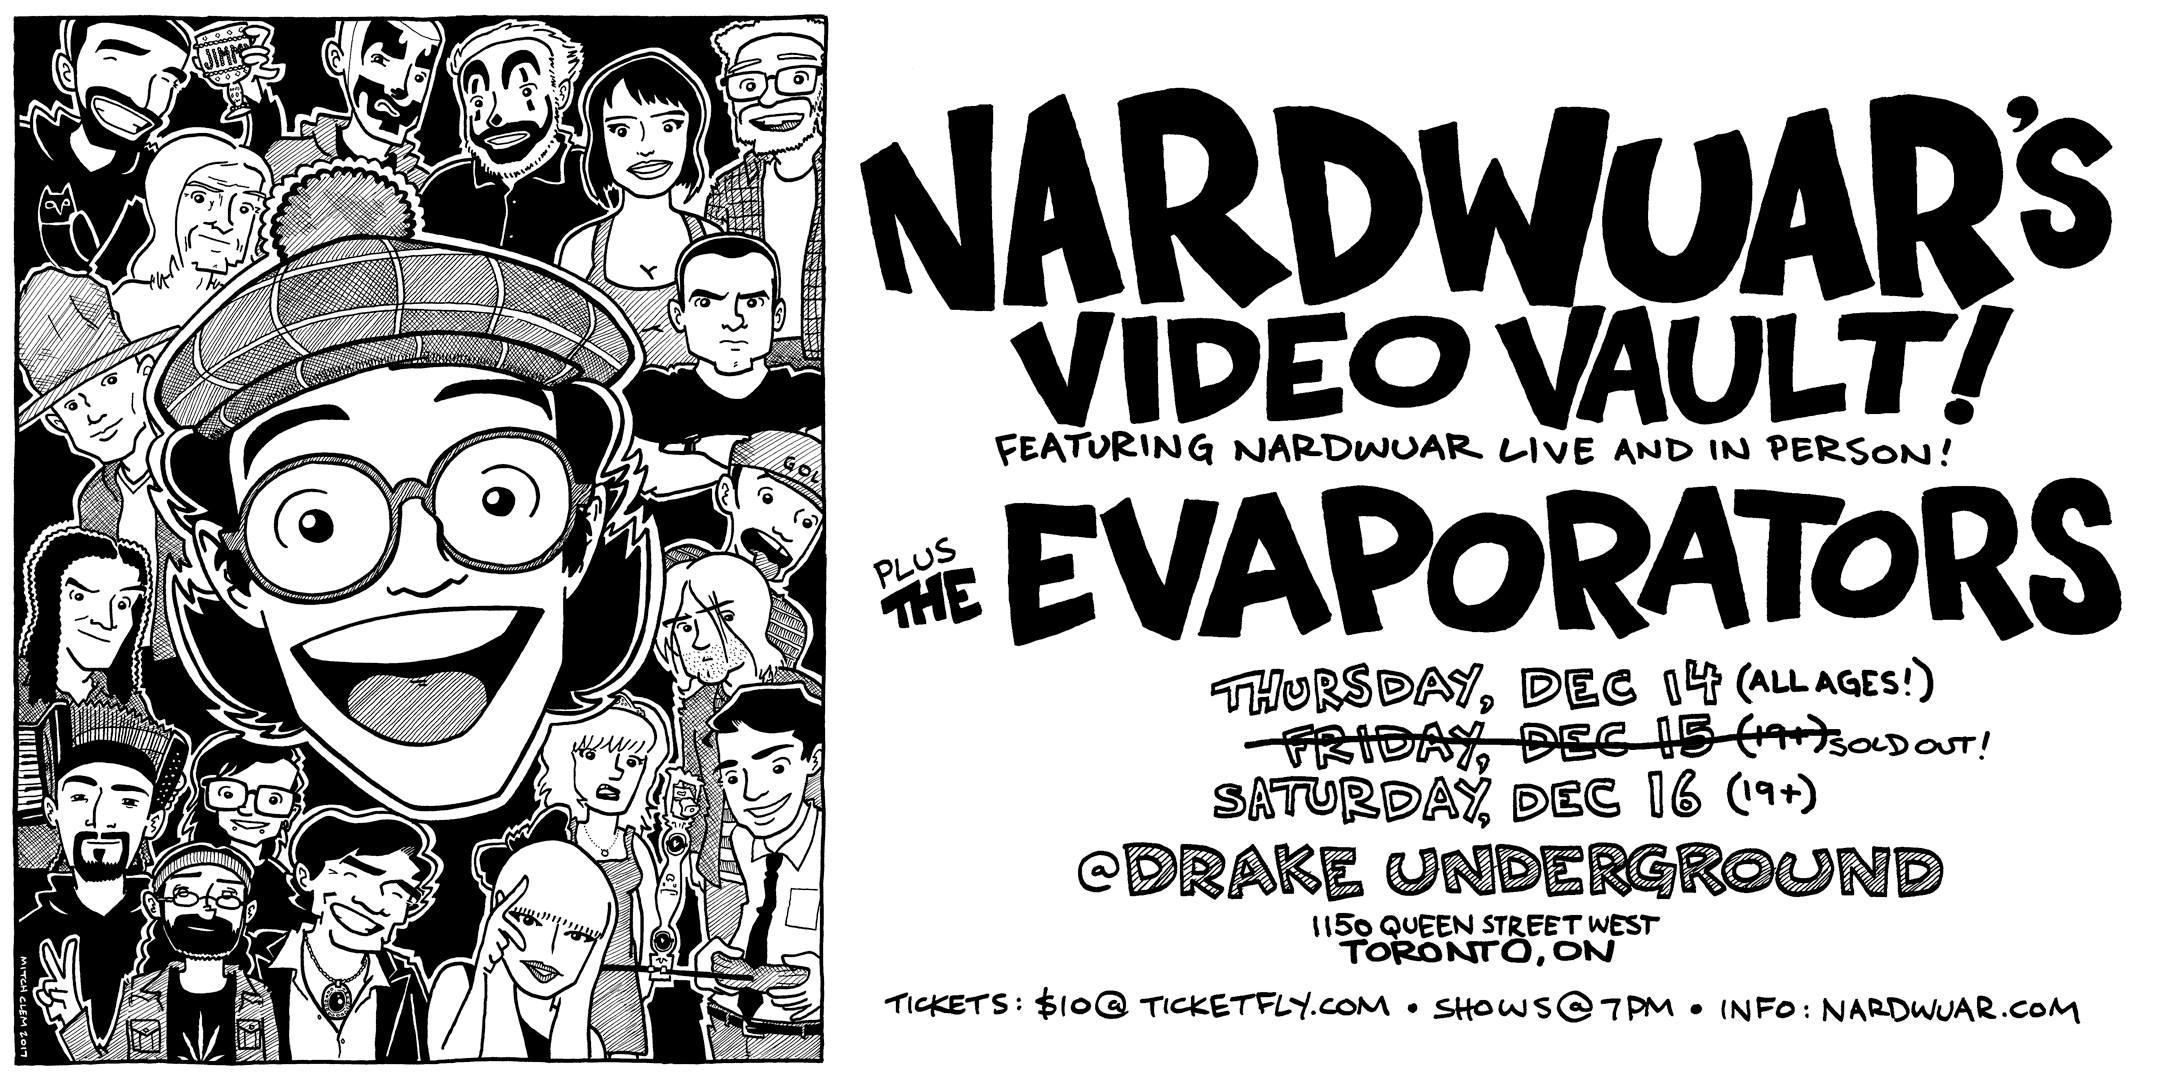 Nardwuar's Video Vault w The Evaporators @ The Drake Underground